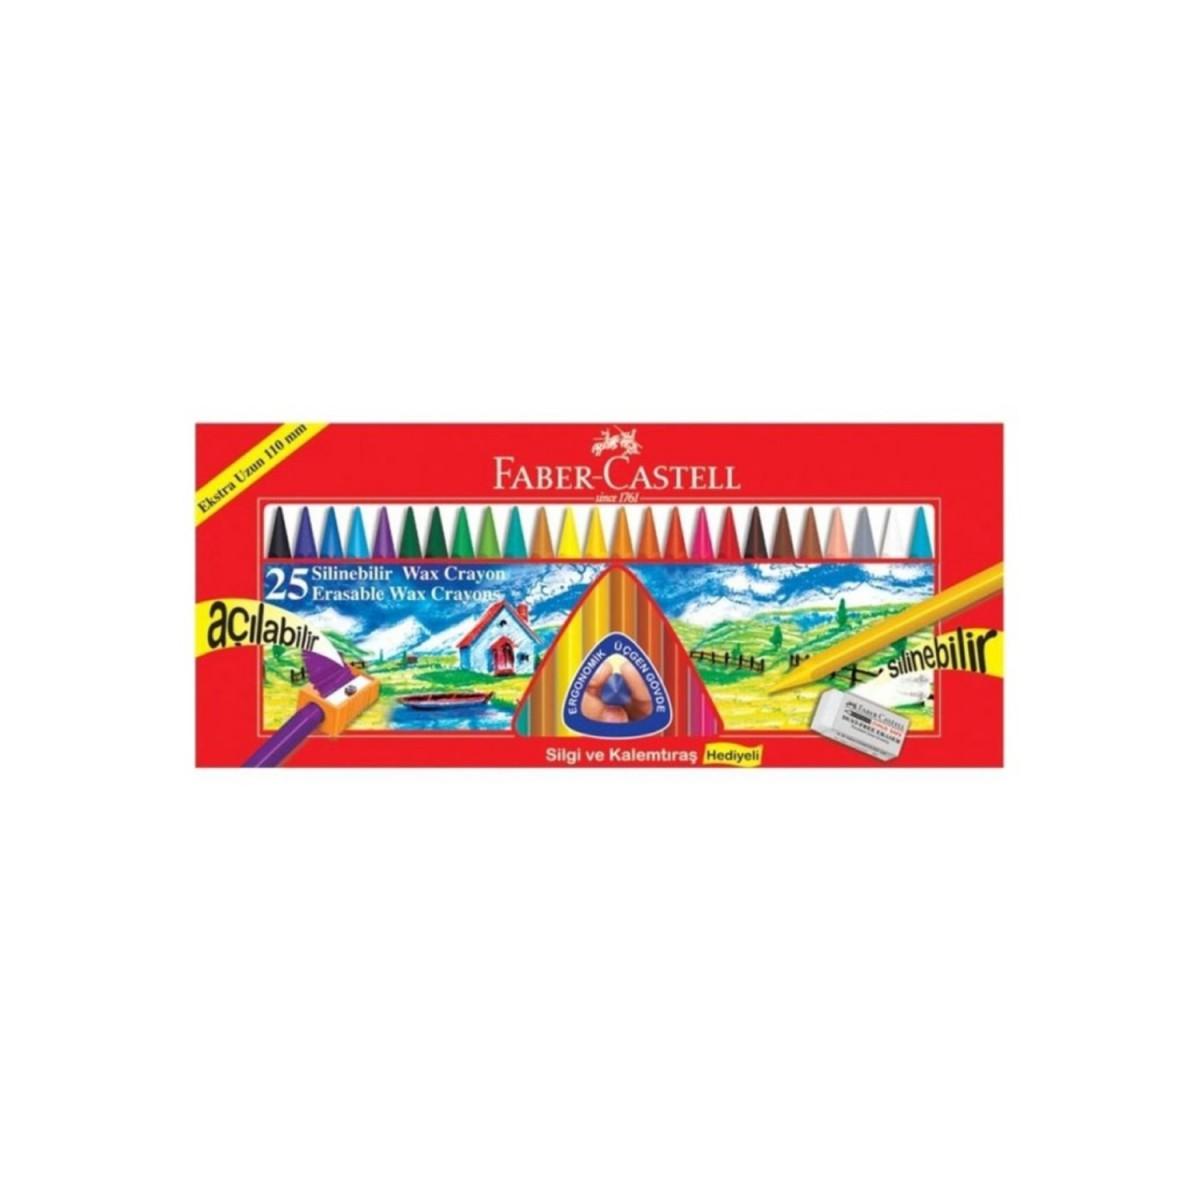 Faber Castell 25 Renk Silinebilir Mum Boya